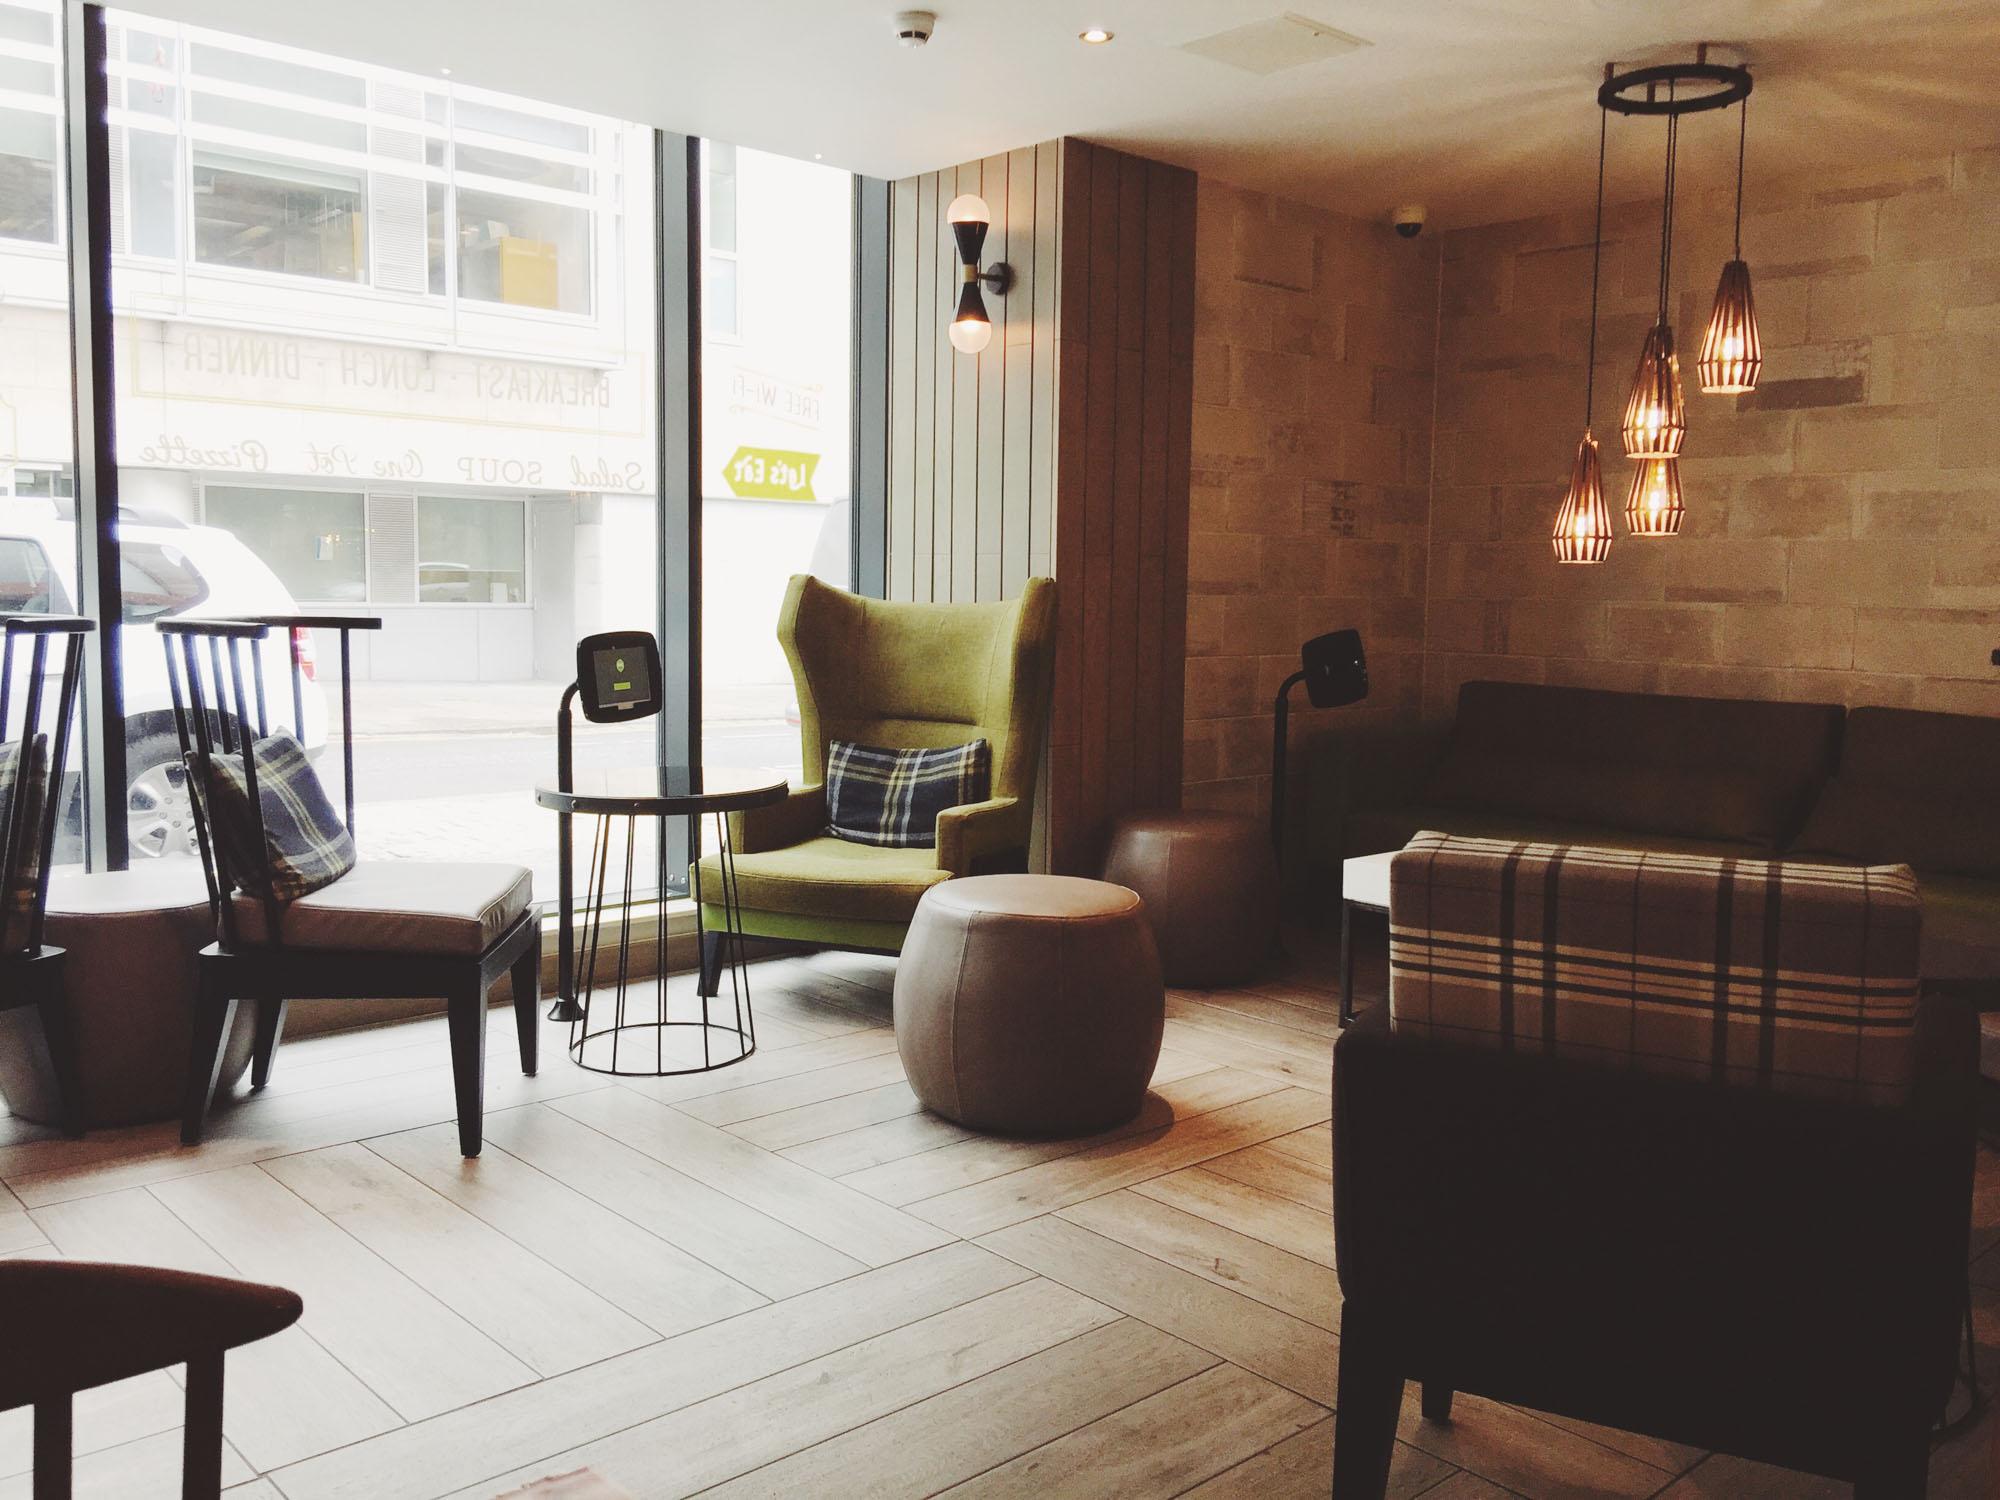 hub by Premier Inn, Edinburgh